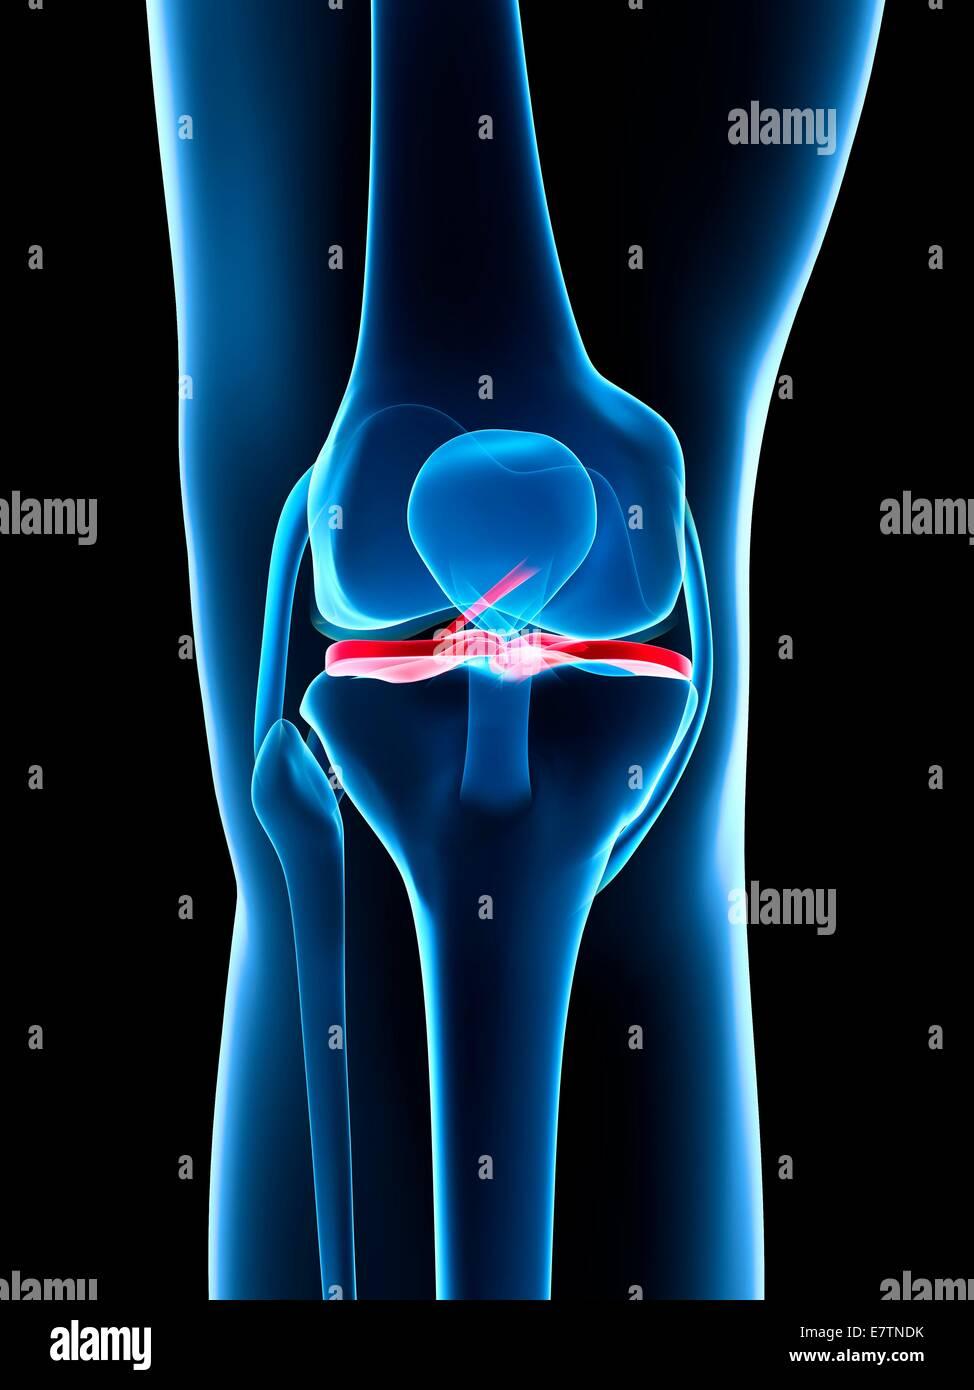 Human Knee Ligaments Stock Photos & Human Knee Ligaments Stock ...